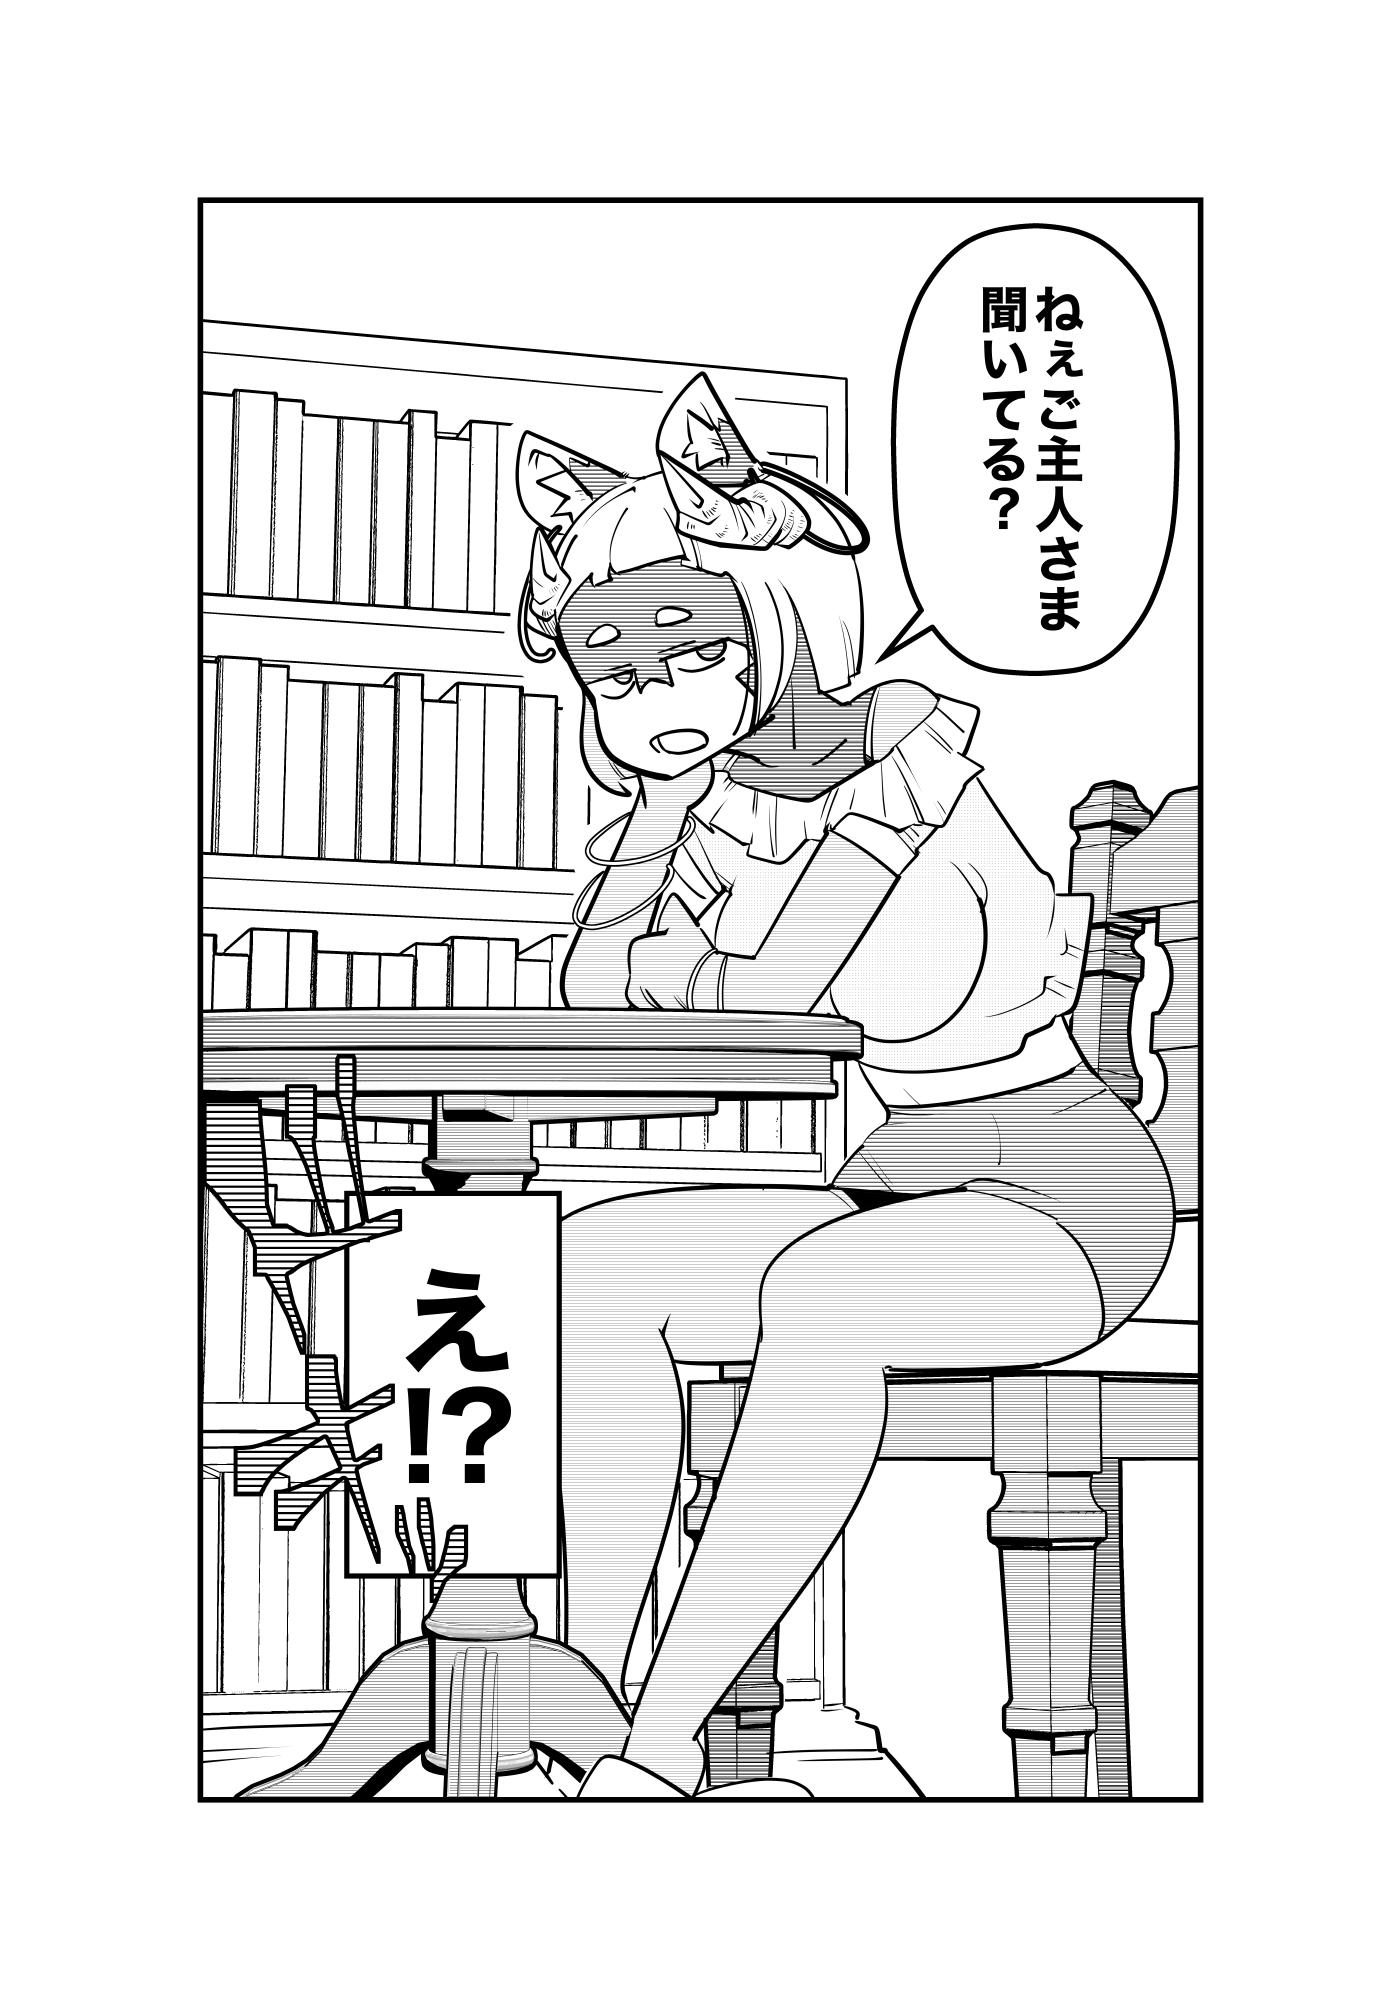 f:id:terashimaru117:20210915015516p:plain